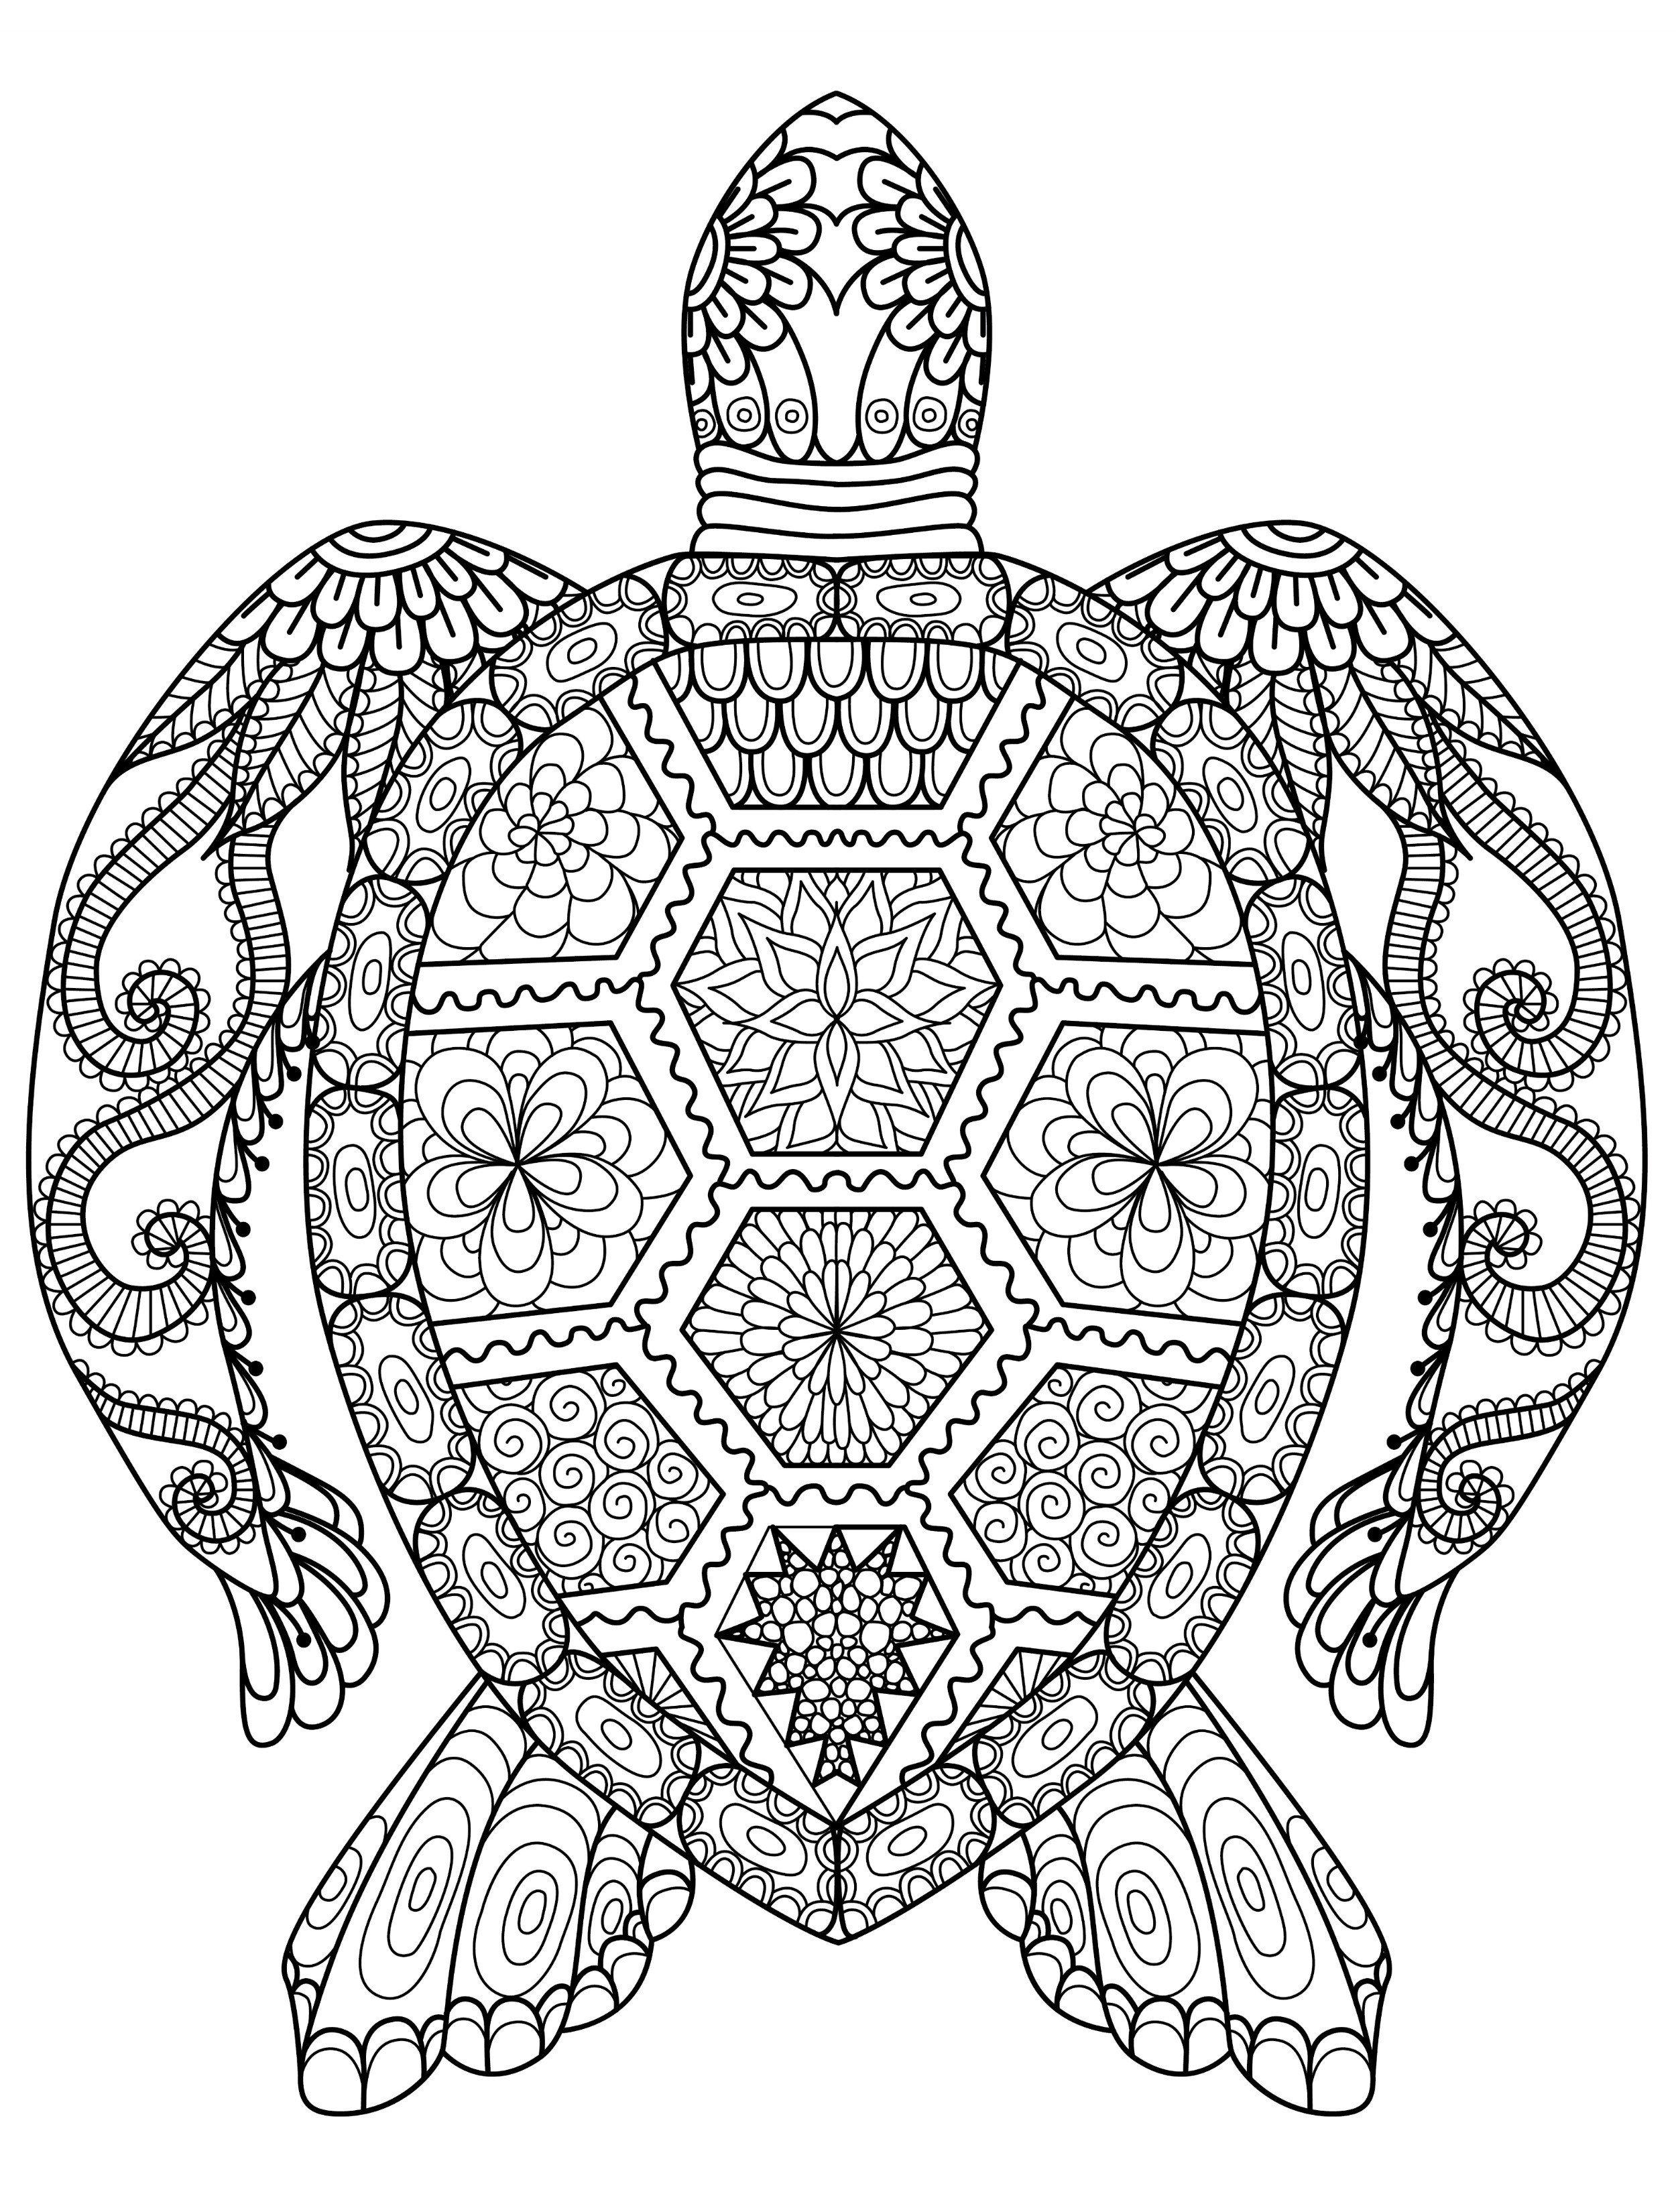 2500x3300 Animal Mandala Coloring Pages Smart Inspiration Printable Coloring